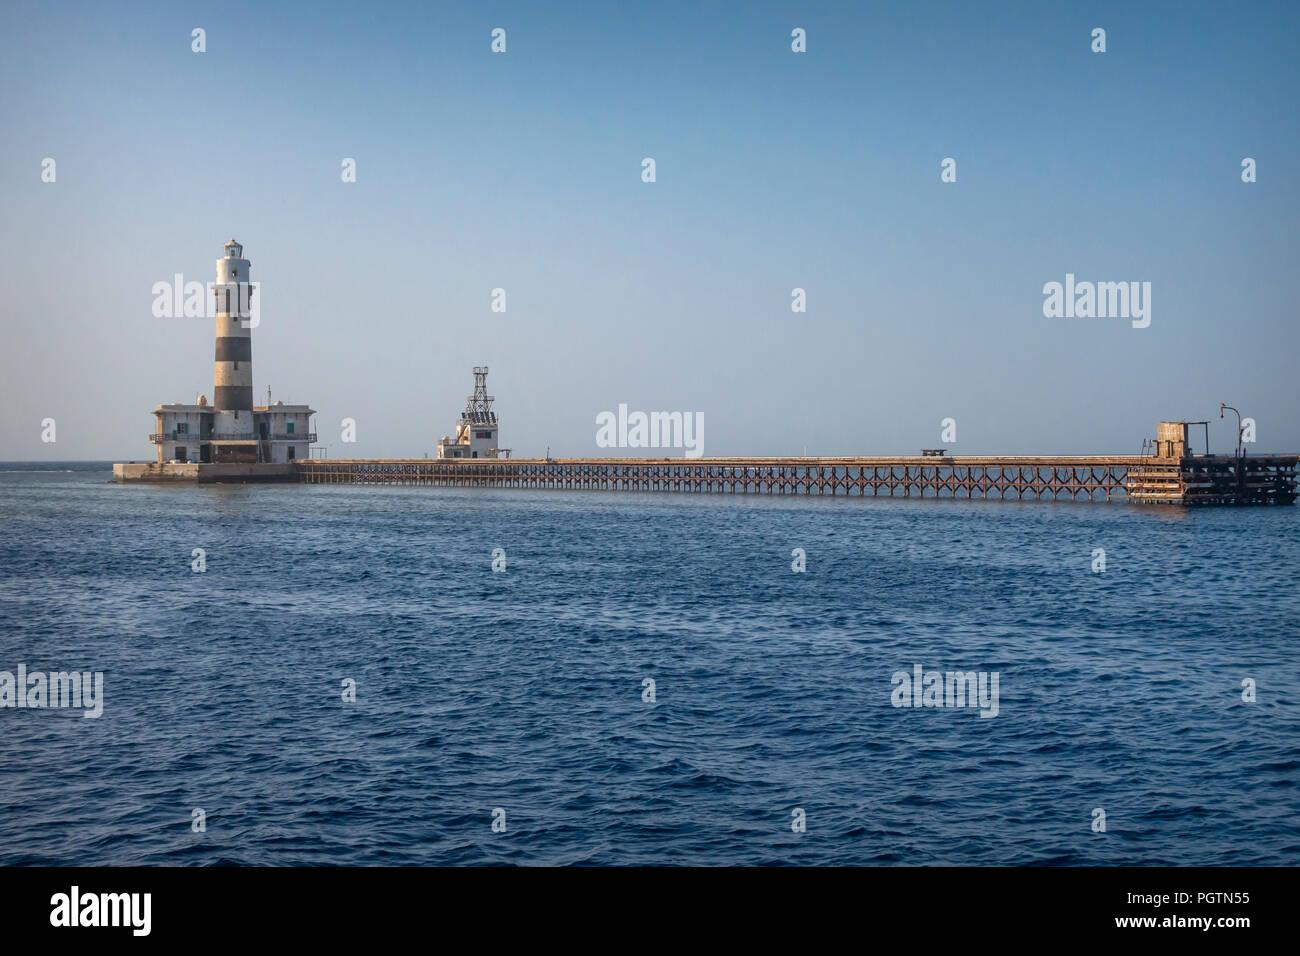 Daedalus Reef Light House - Stock Image